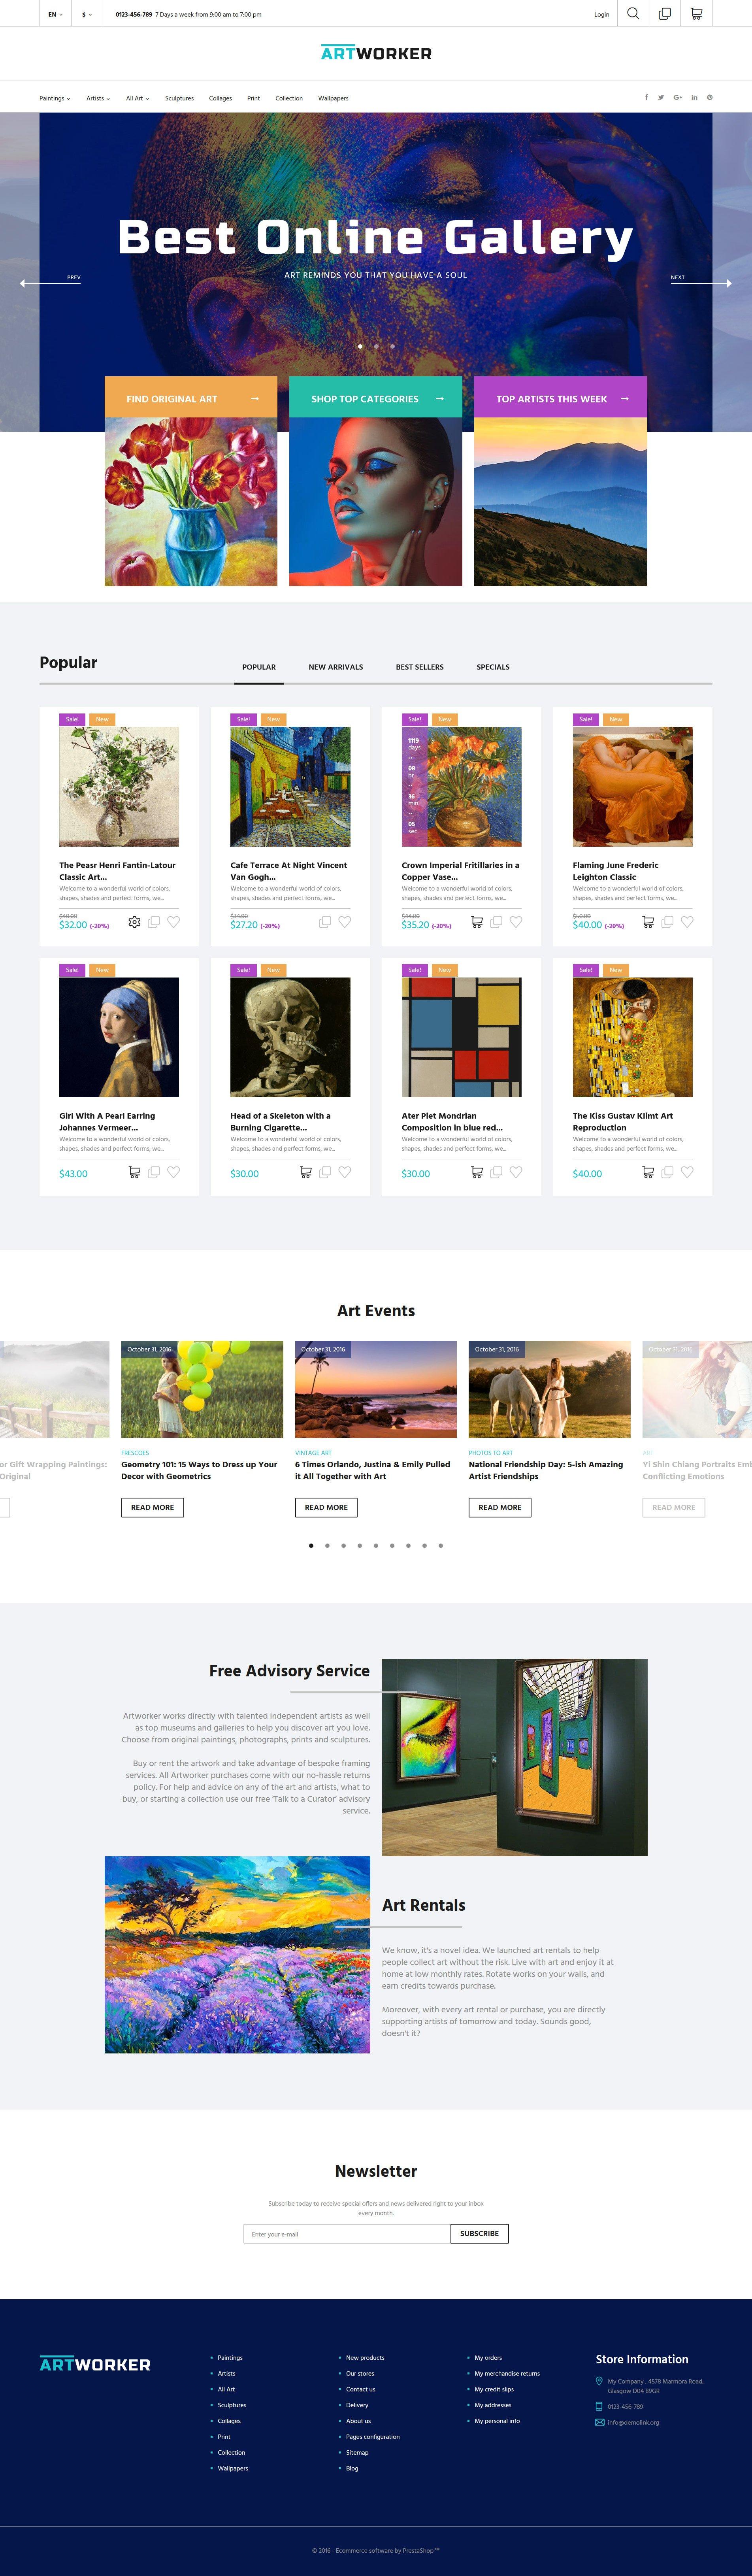 Responsywny szablon PrestaShop Artworker - Online Gallery & Artist Portfolio #62011